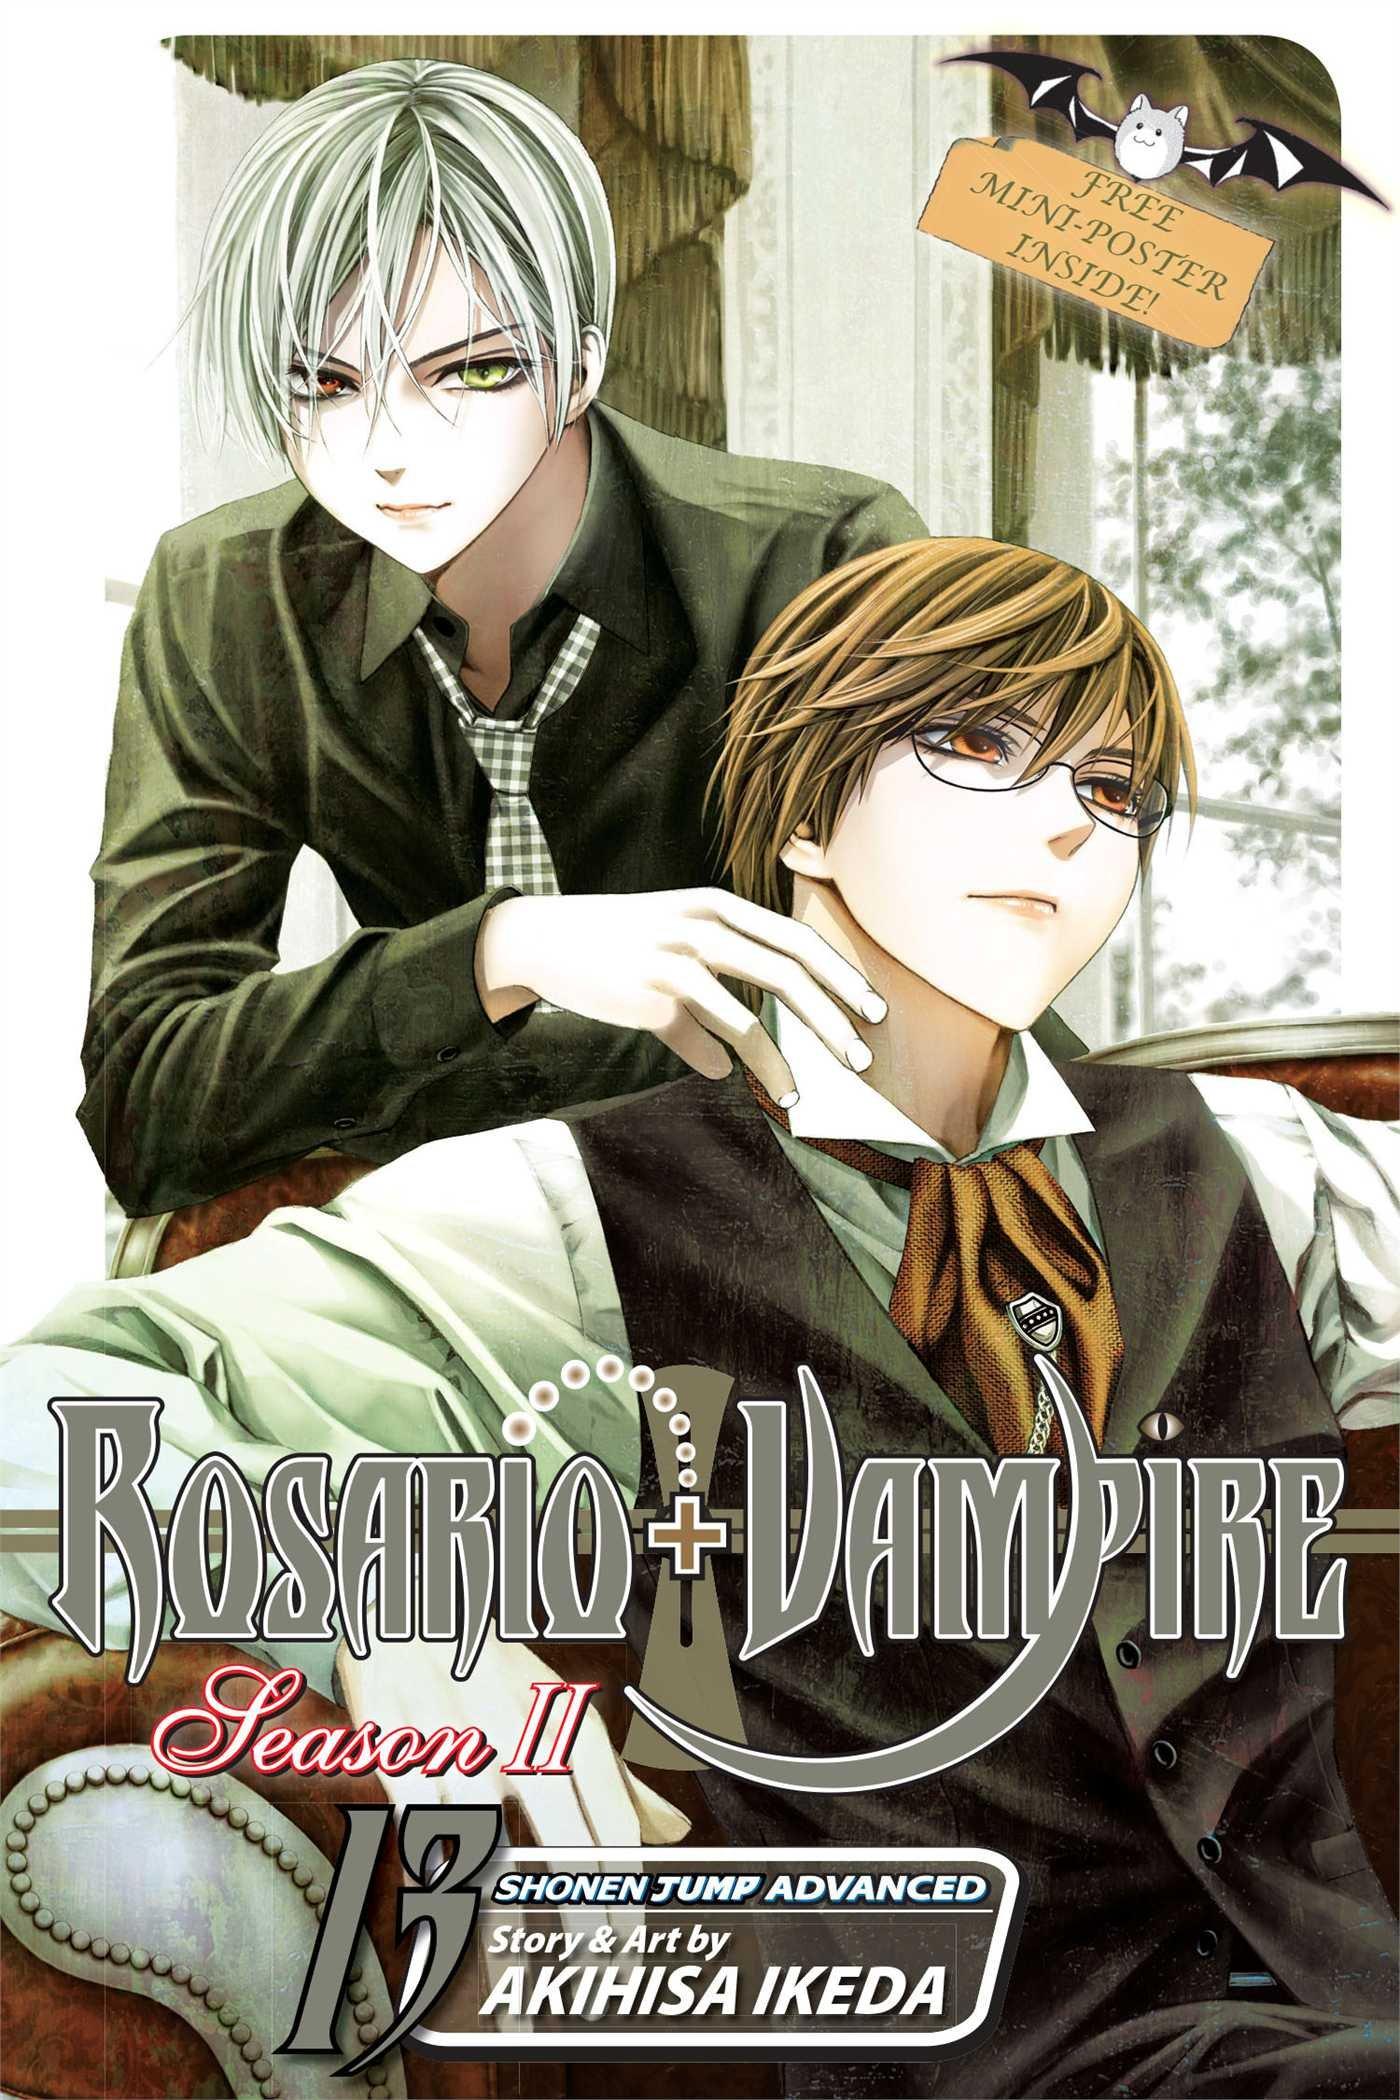 rosario vampire season ii vol 13 akihisa ikeda 9781421569499